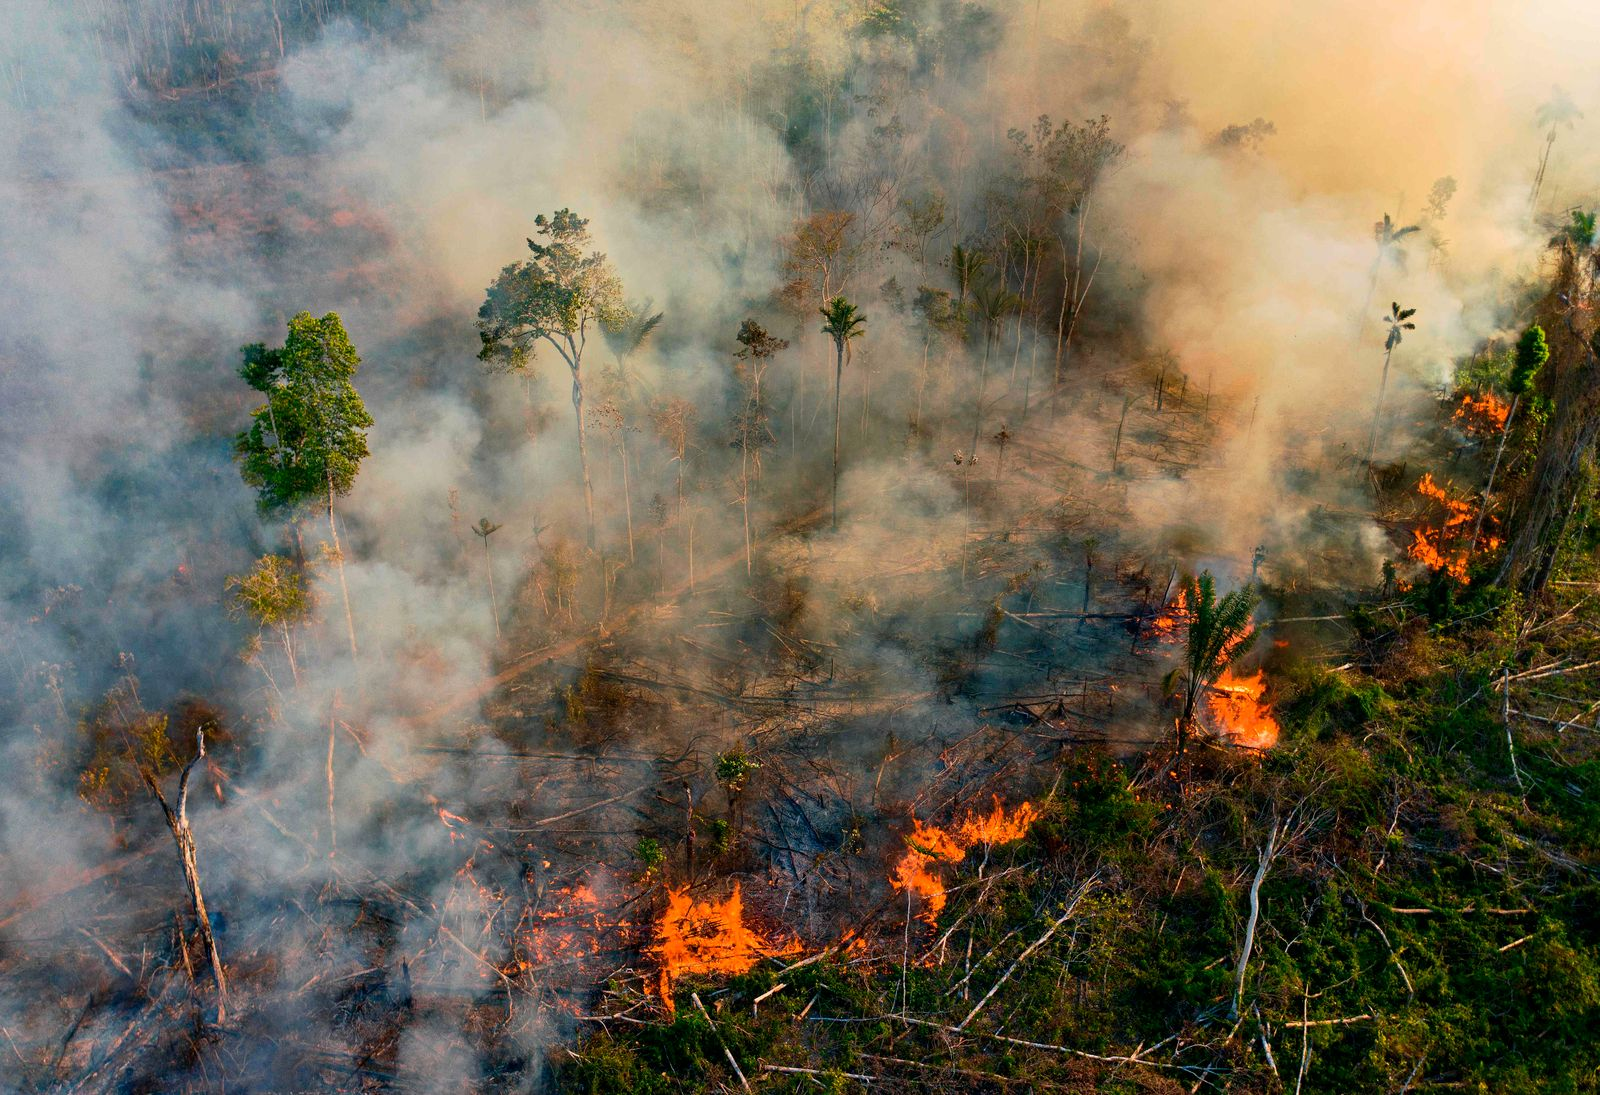 FILES-BRAZIL-AMAZON-FIRES